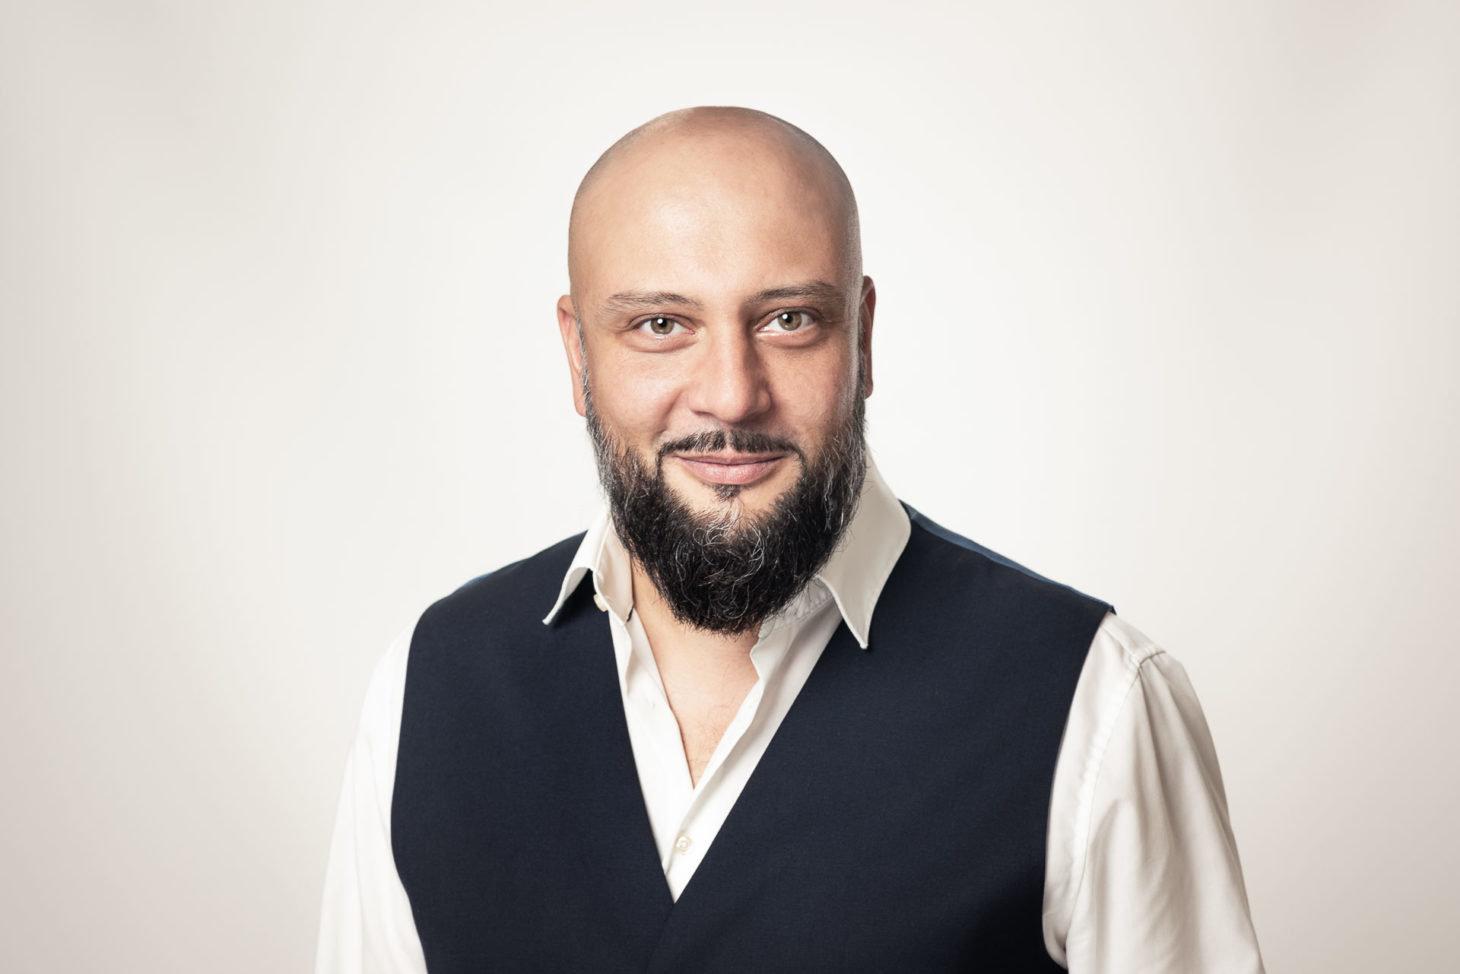 Daniel Zaman